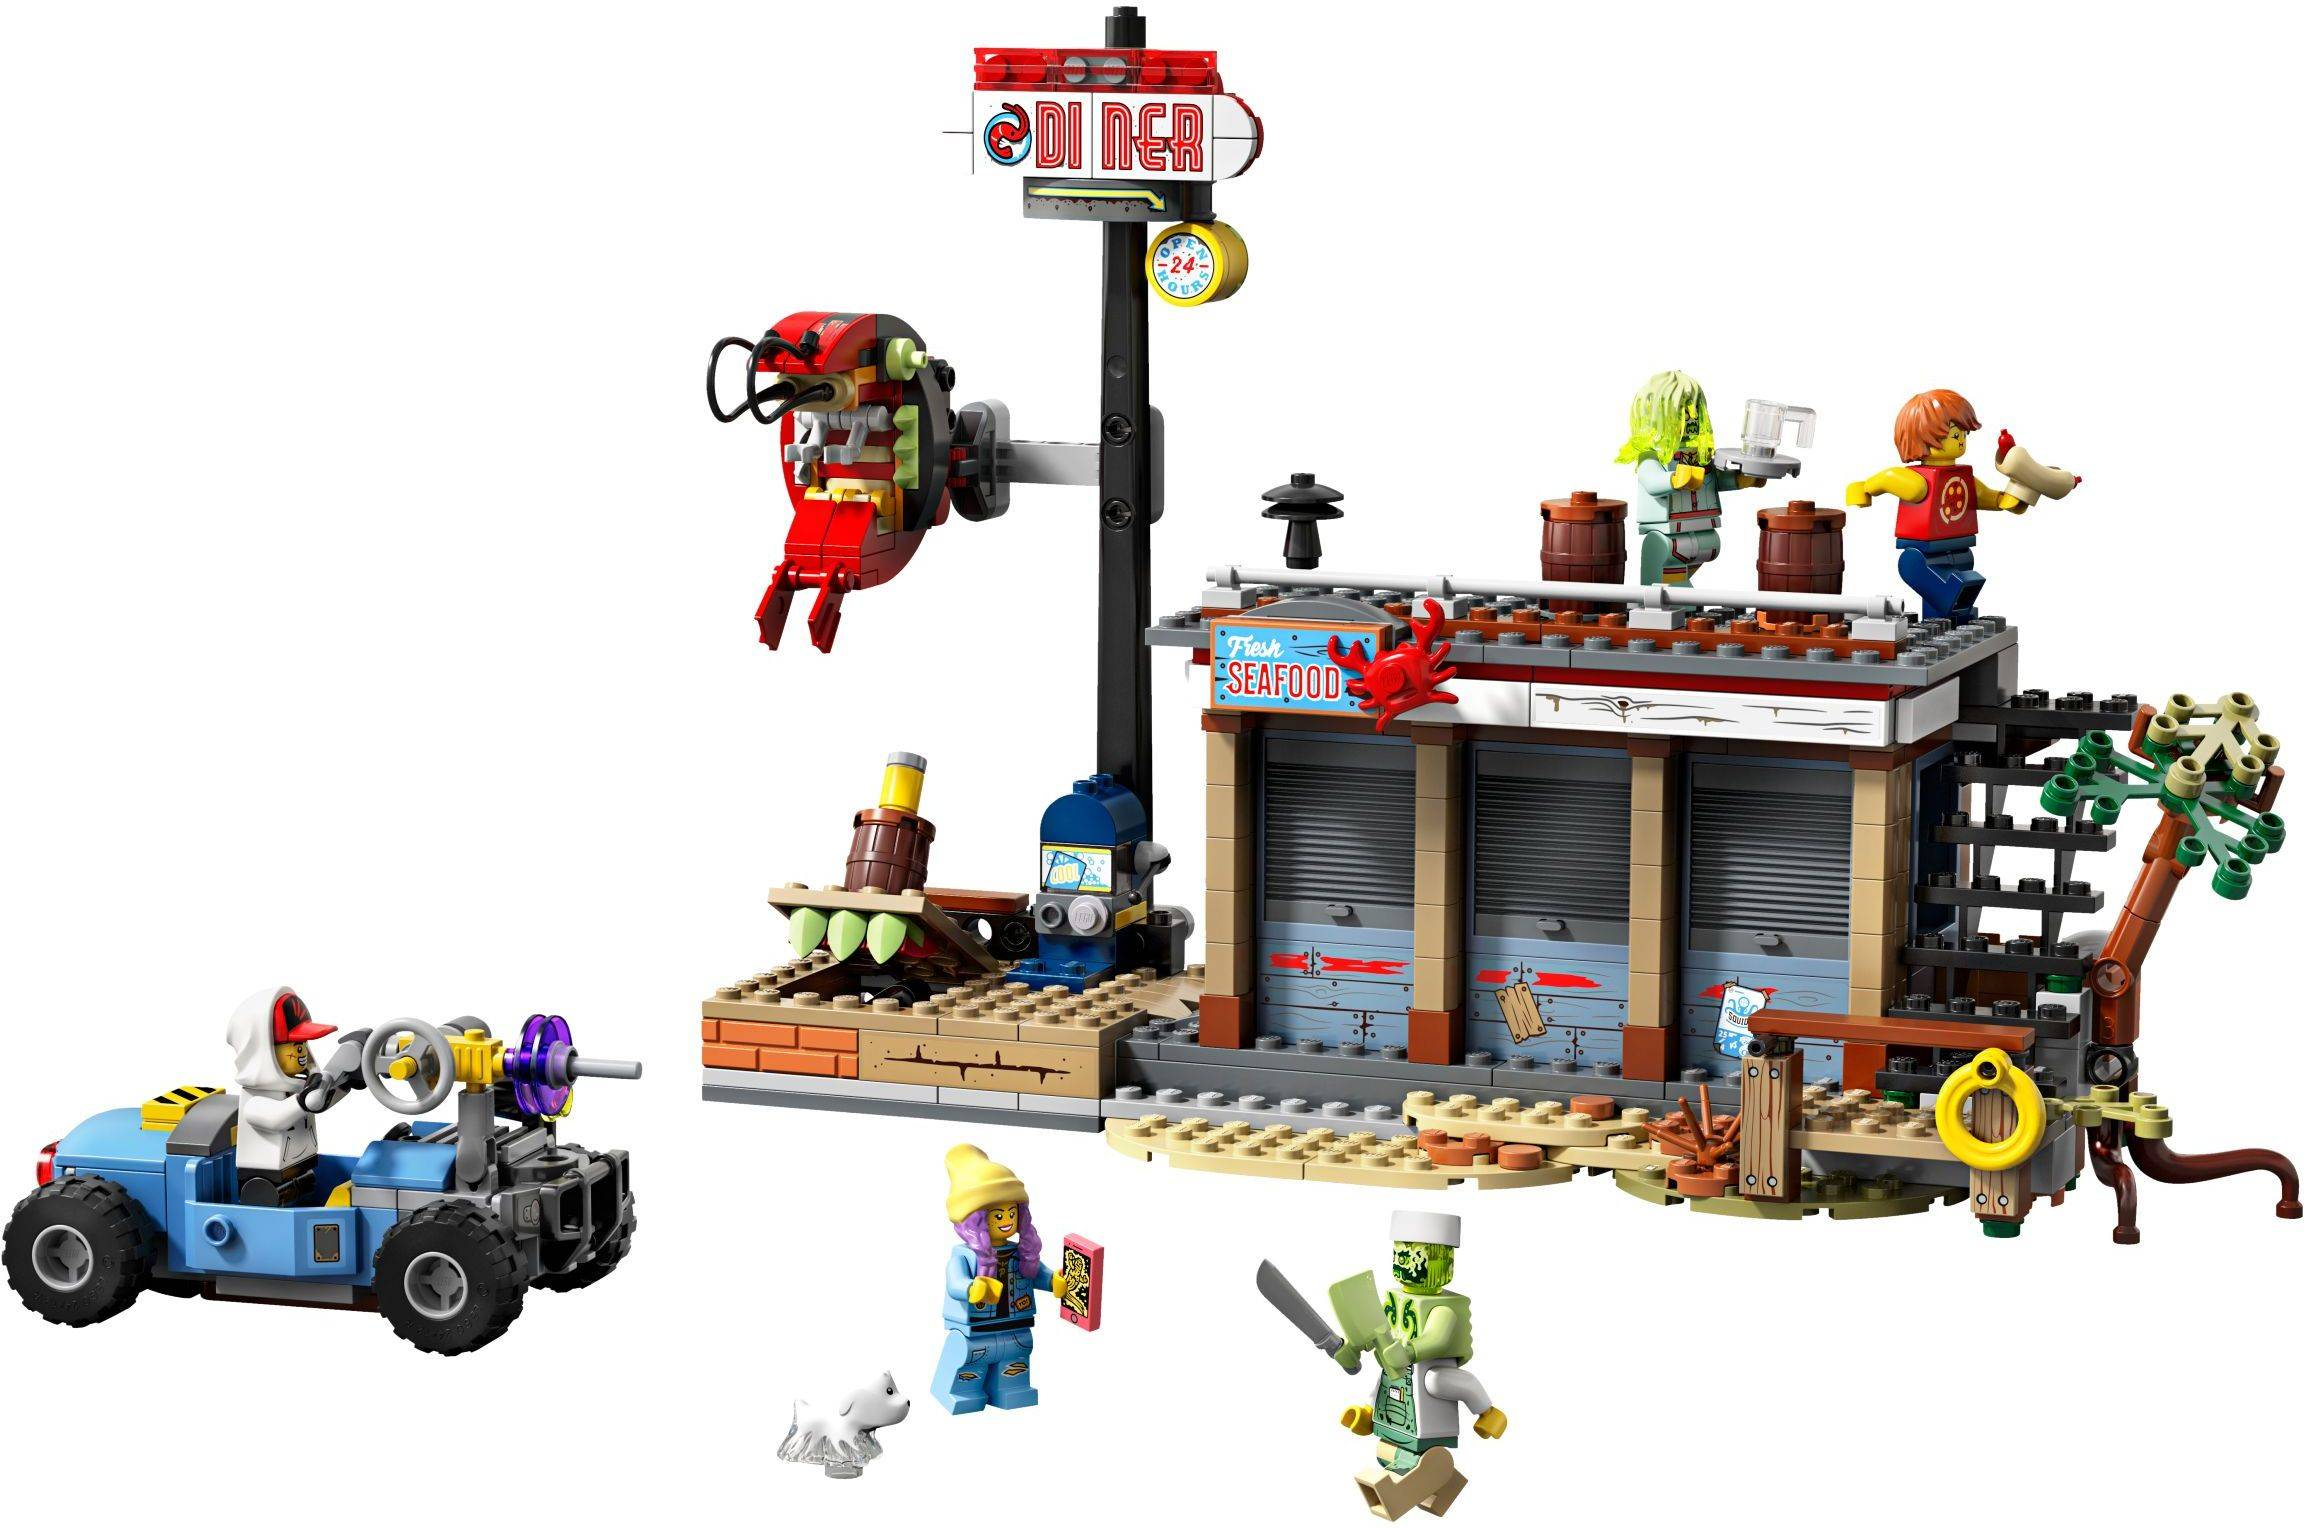 LEGO 10179 Ultimate Collector's Millennium Falcon